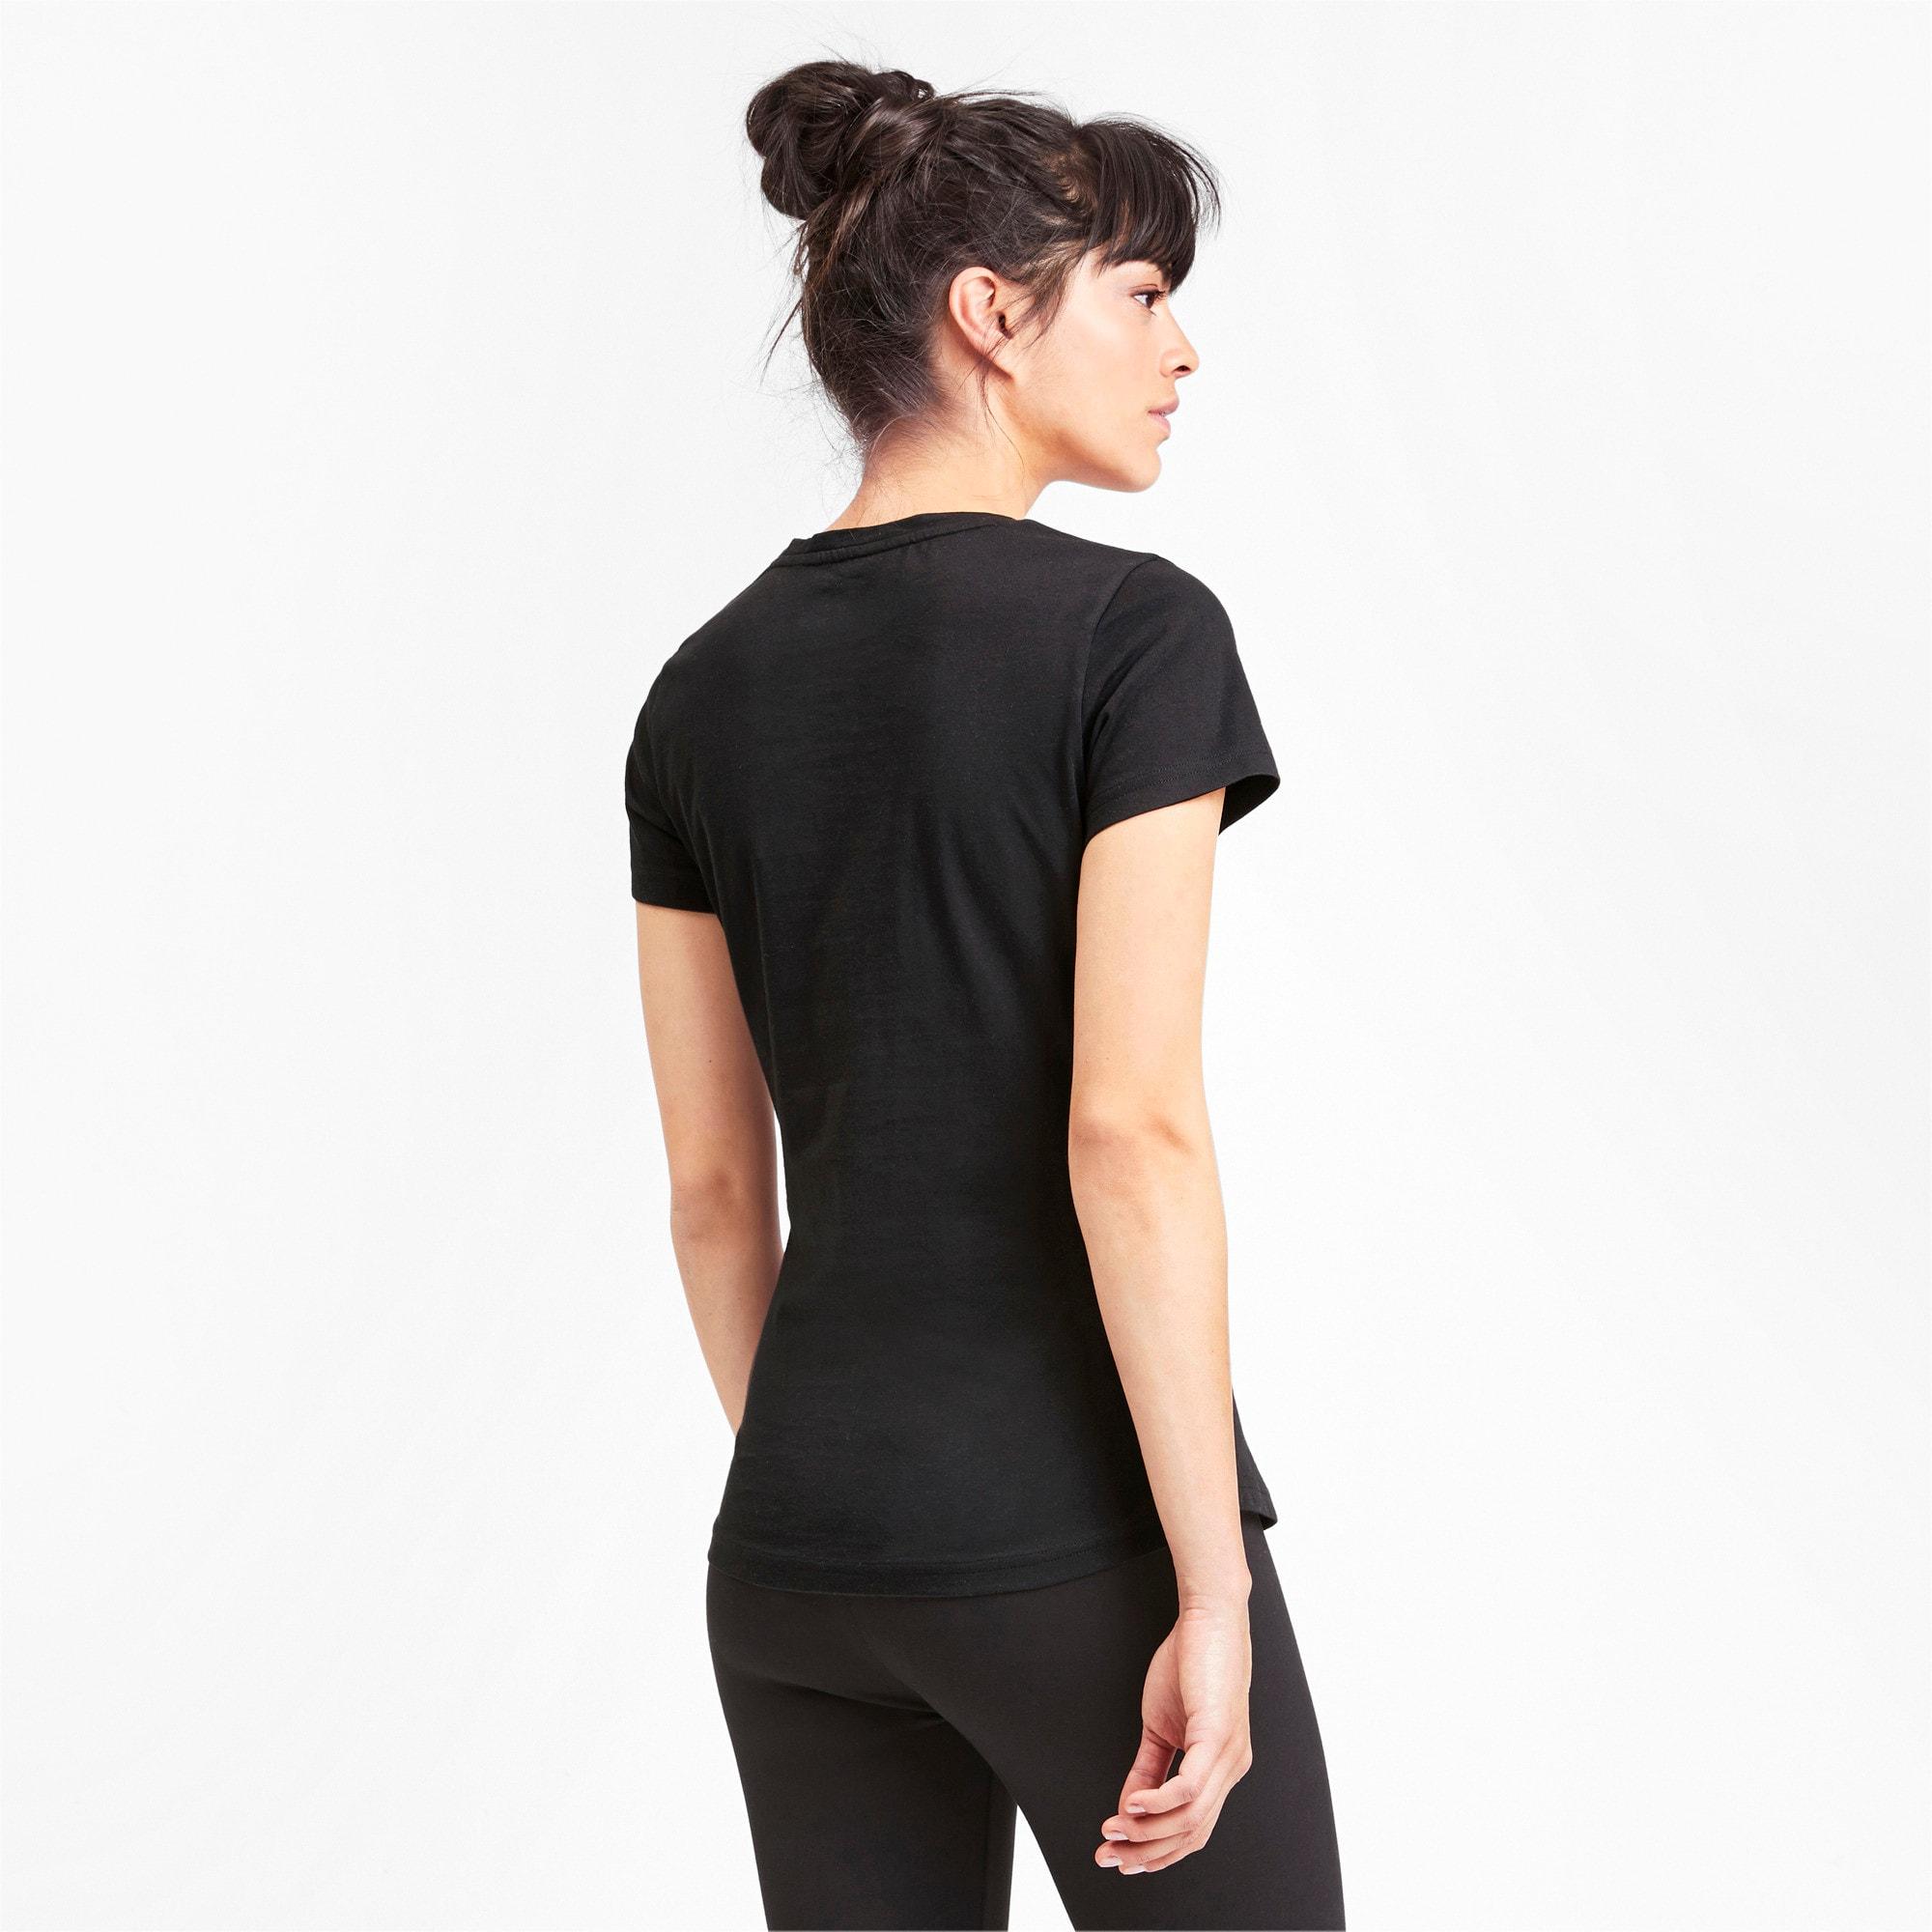 Thumbnail 3 of Rebel Short Sleeve Women's Tee, Puma Black, medium-IND